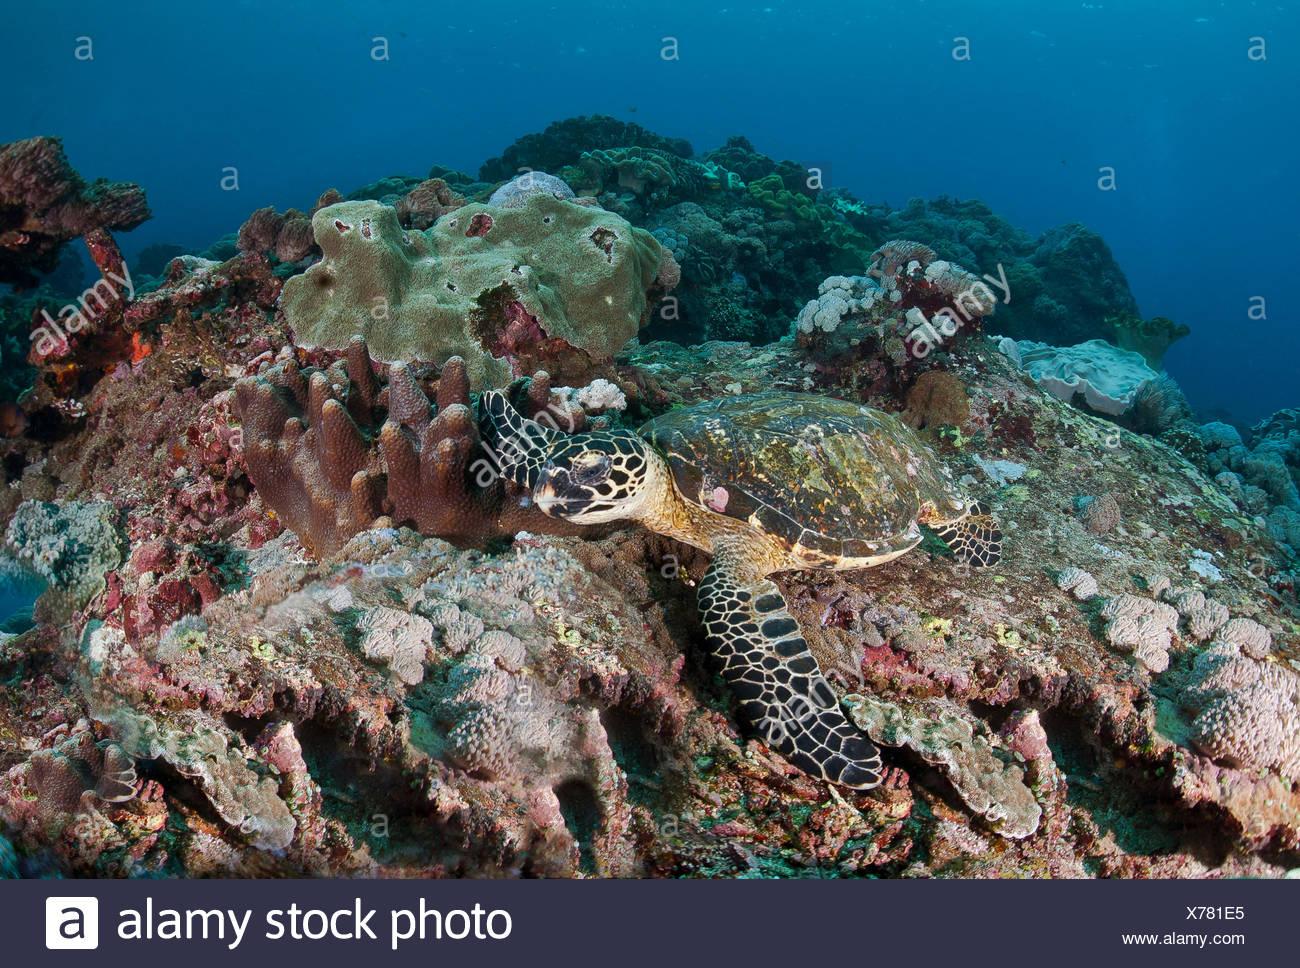 Hawksbill sea turtle (Eretmochelys imbricata), Nusa Lembongan, Small Sunda Islands, Indonesia - Stock Image